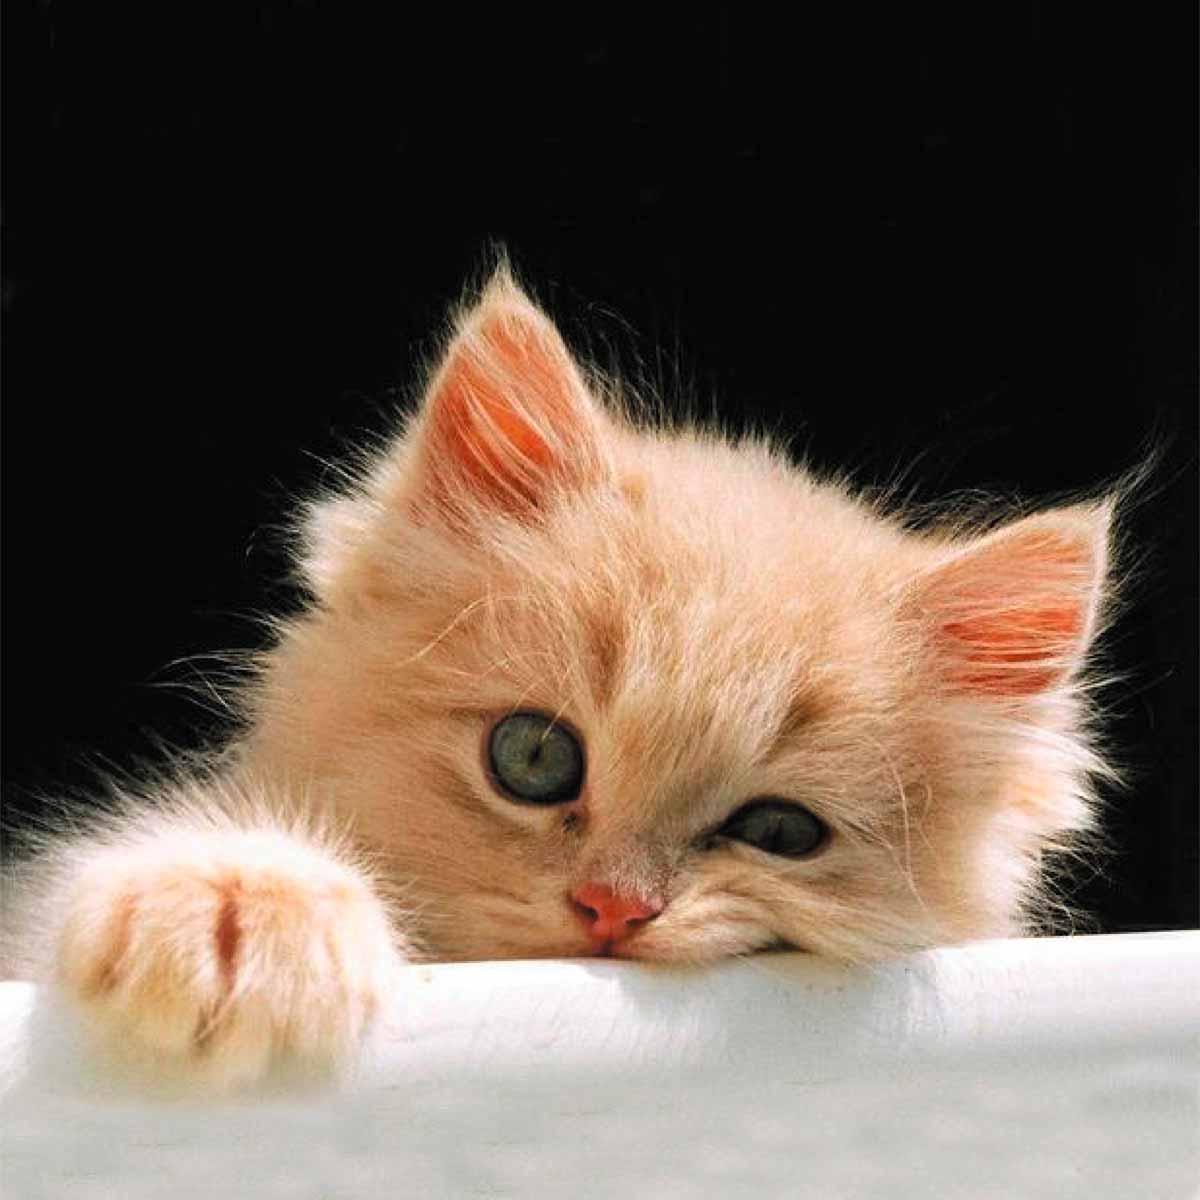 шварценеггер котенок скучает укручен картинка лет